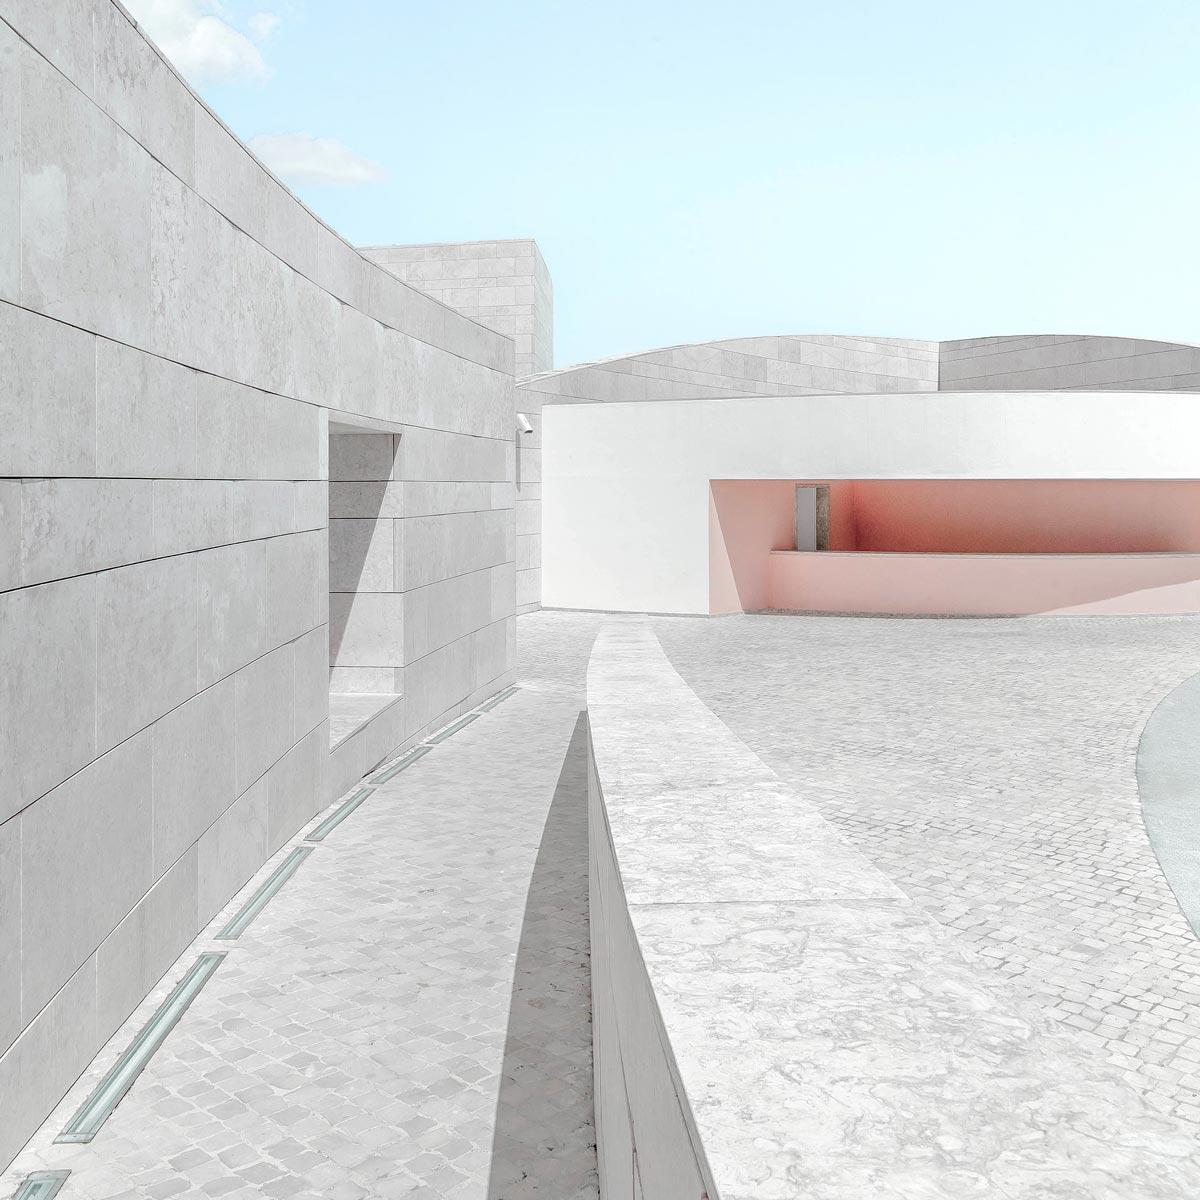 Monumento architettonico